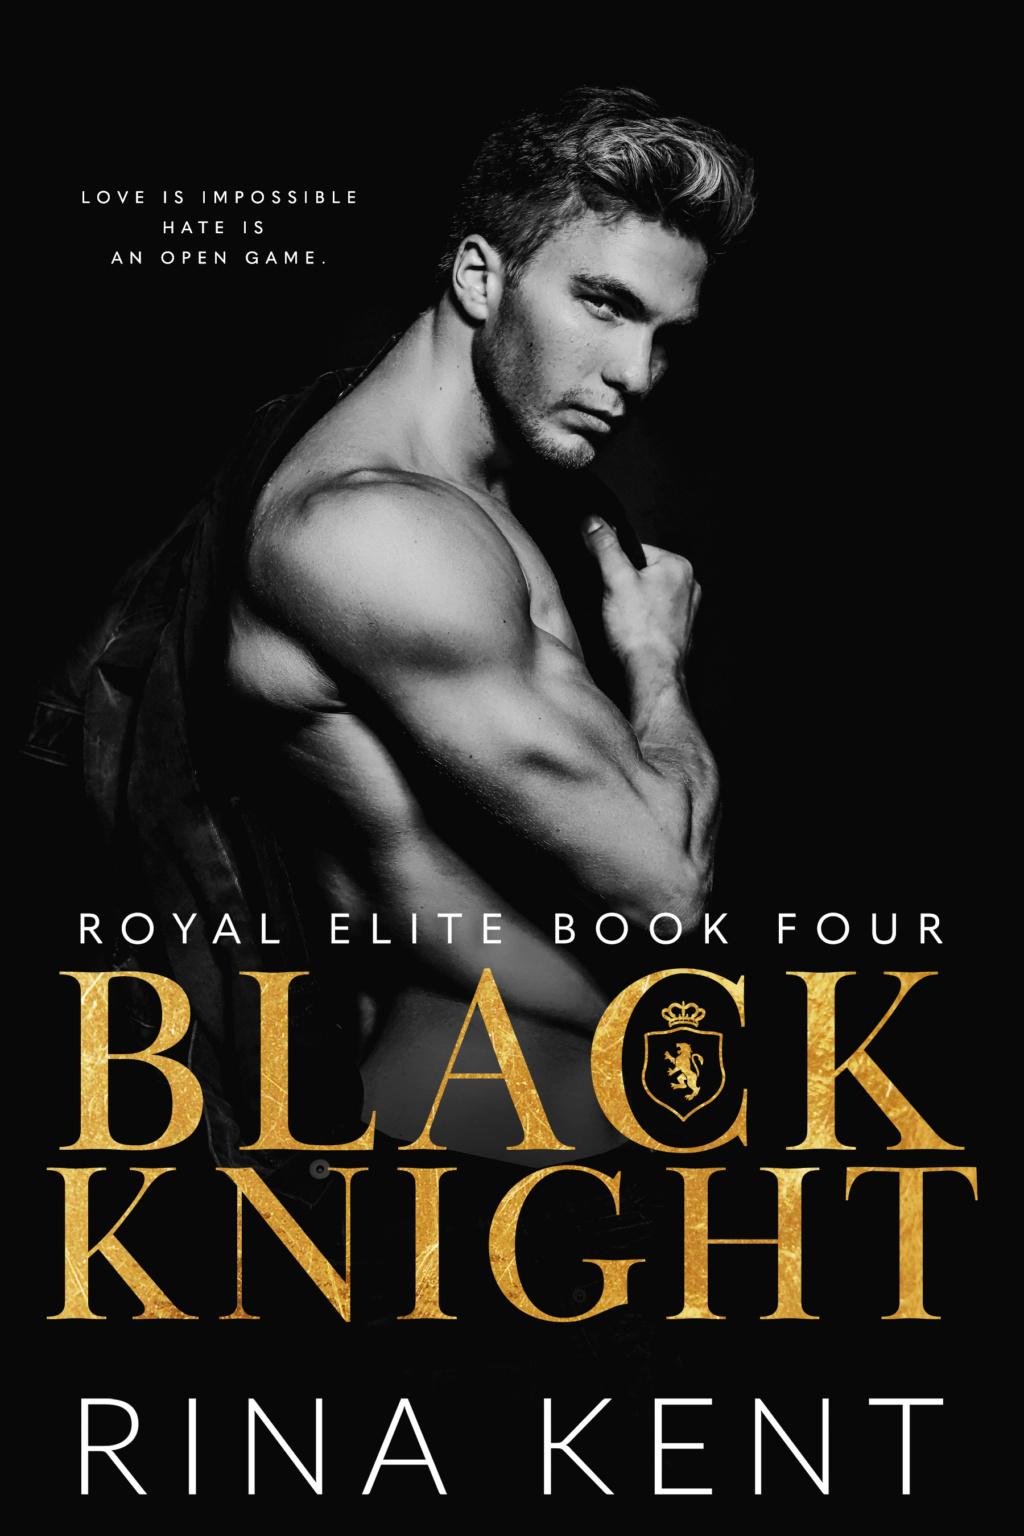 Serie Royal Elite - Rina Kent 4-bkco10